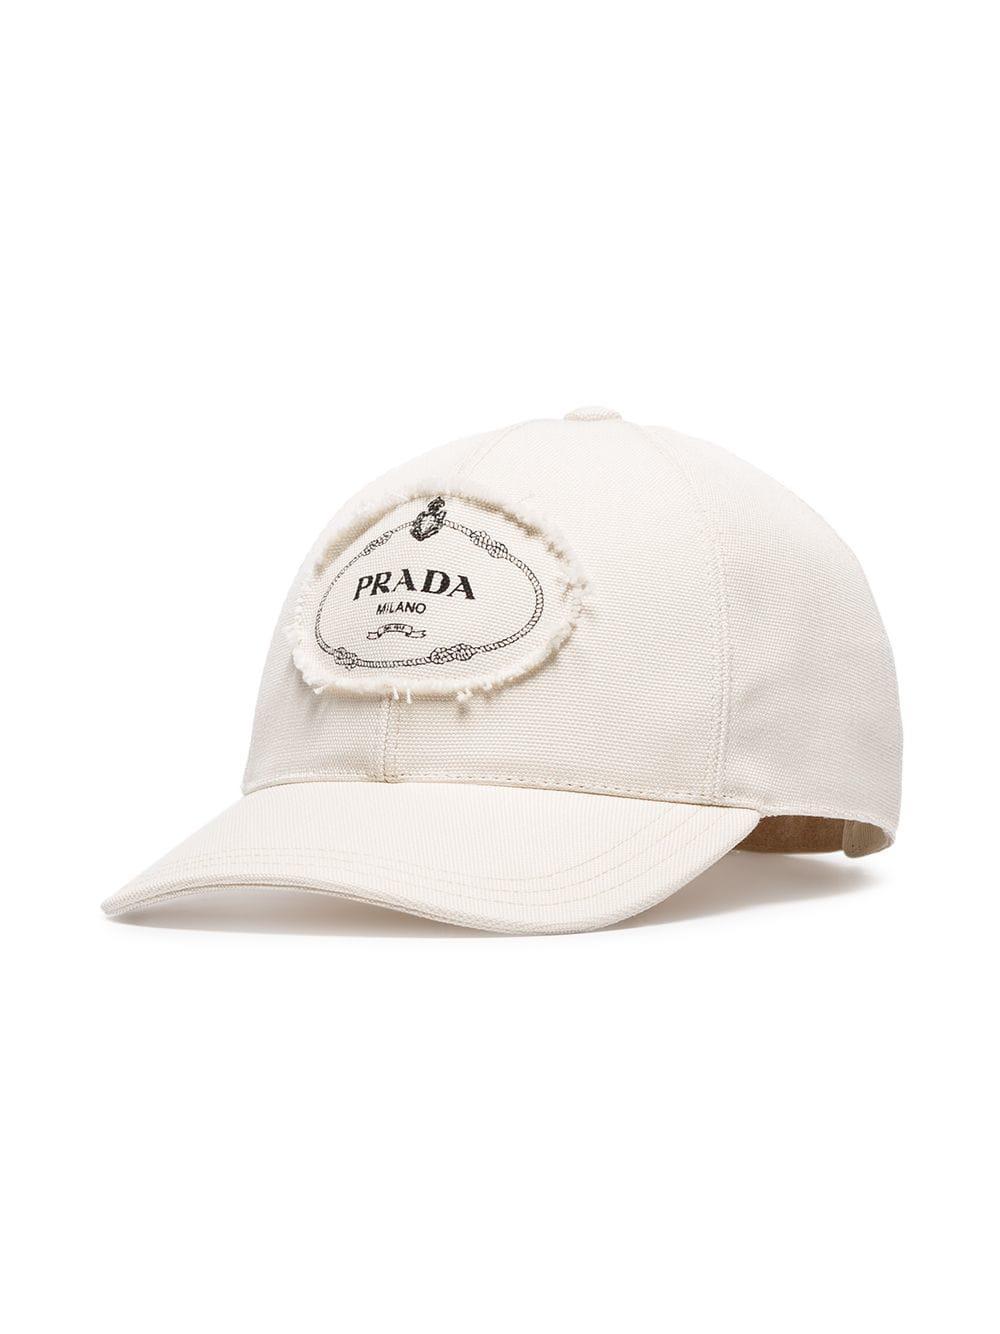 7ec43b9af22 Prada White And Black Logo Print Applique Cotton Cap in White for ...